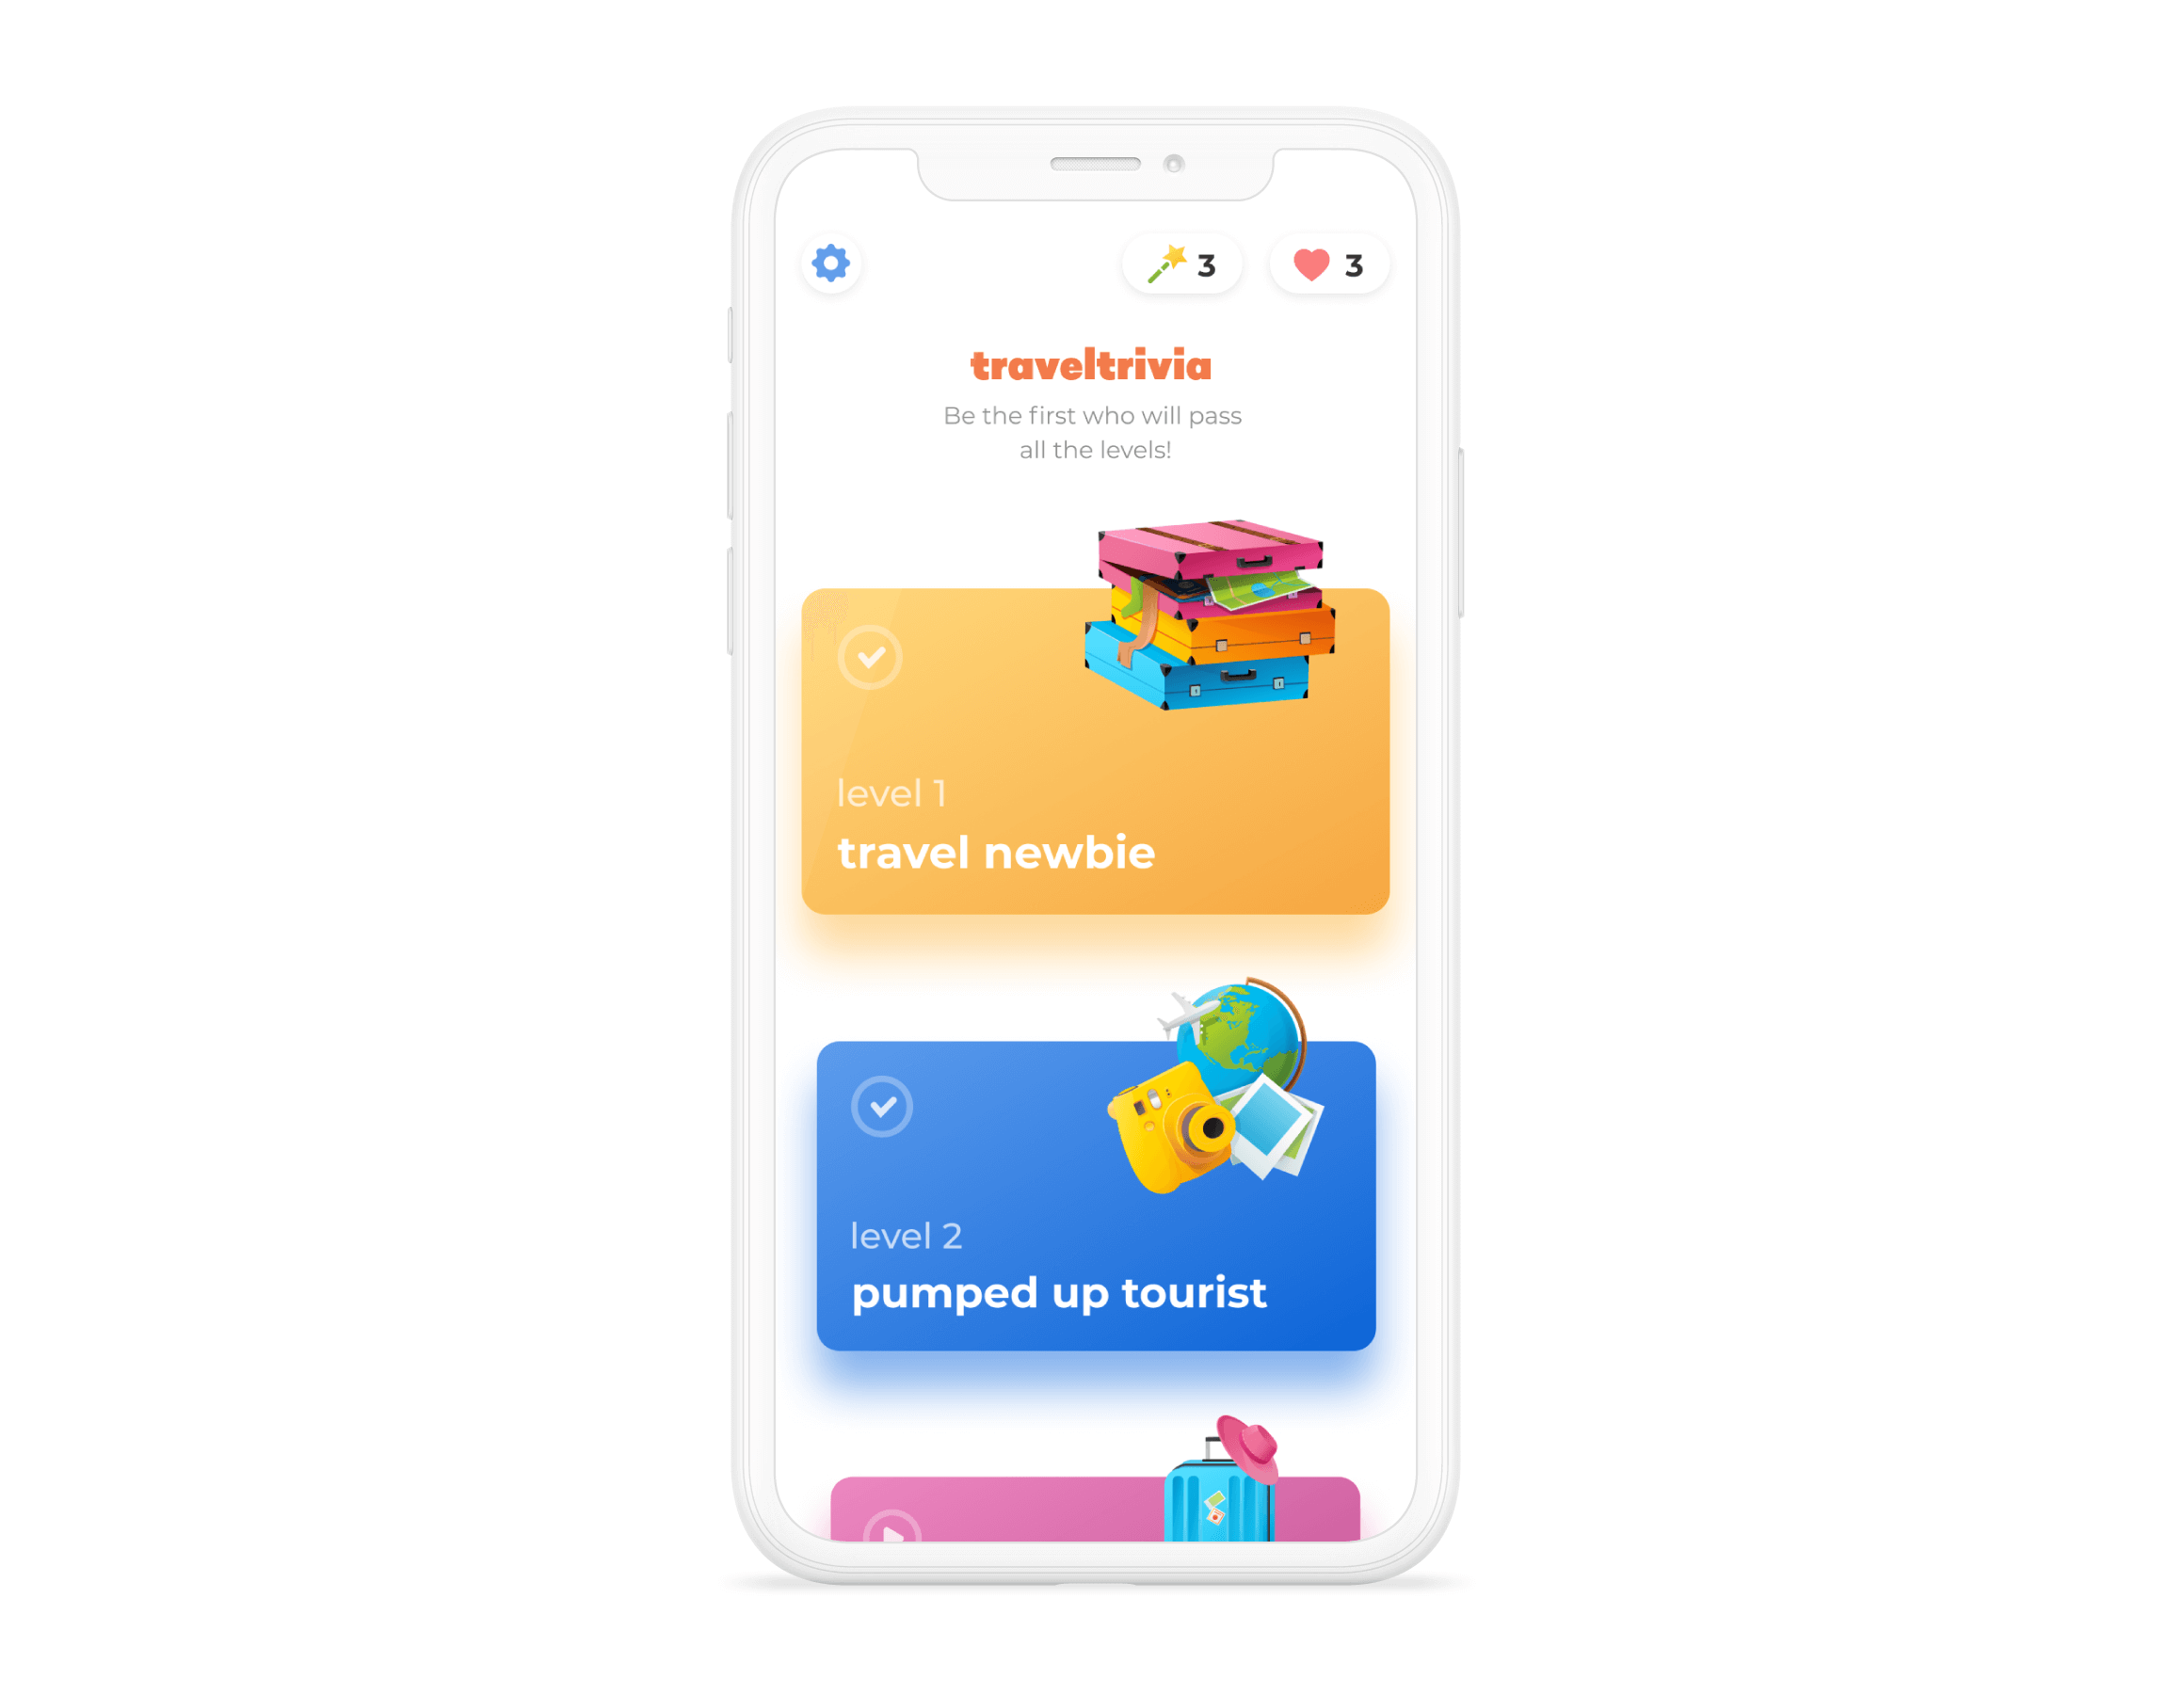 traveltrivia-trivia-game-app-levels